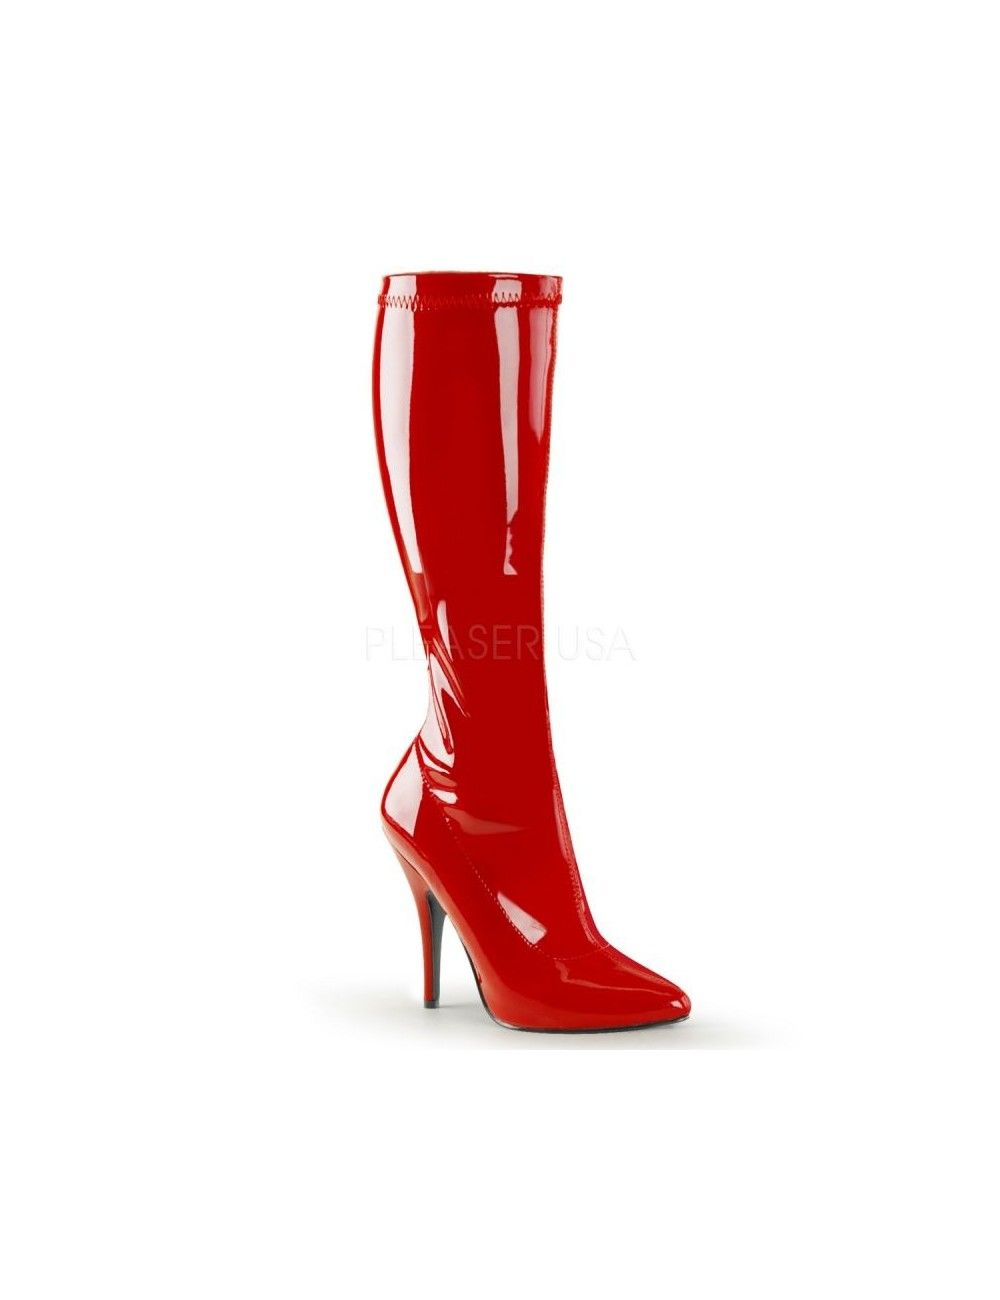 Bottes talon aiguille sexy Rouge Fashion PLEASER